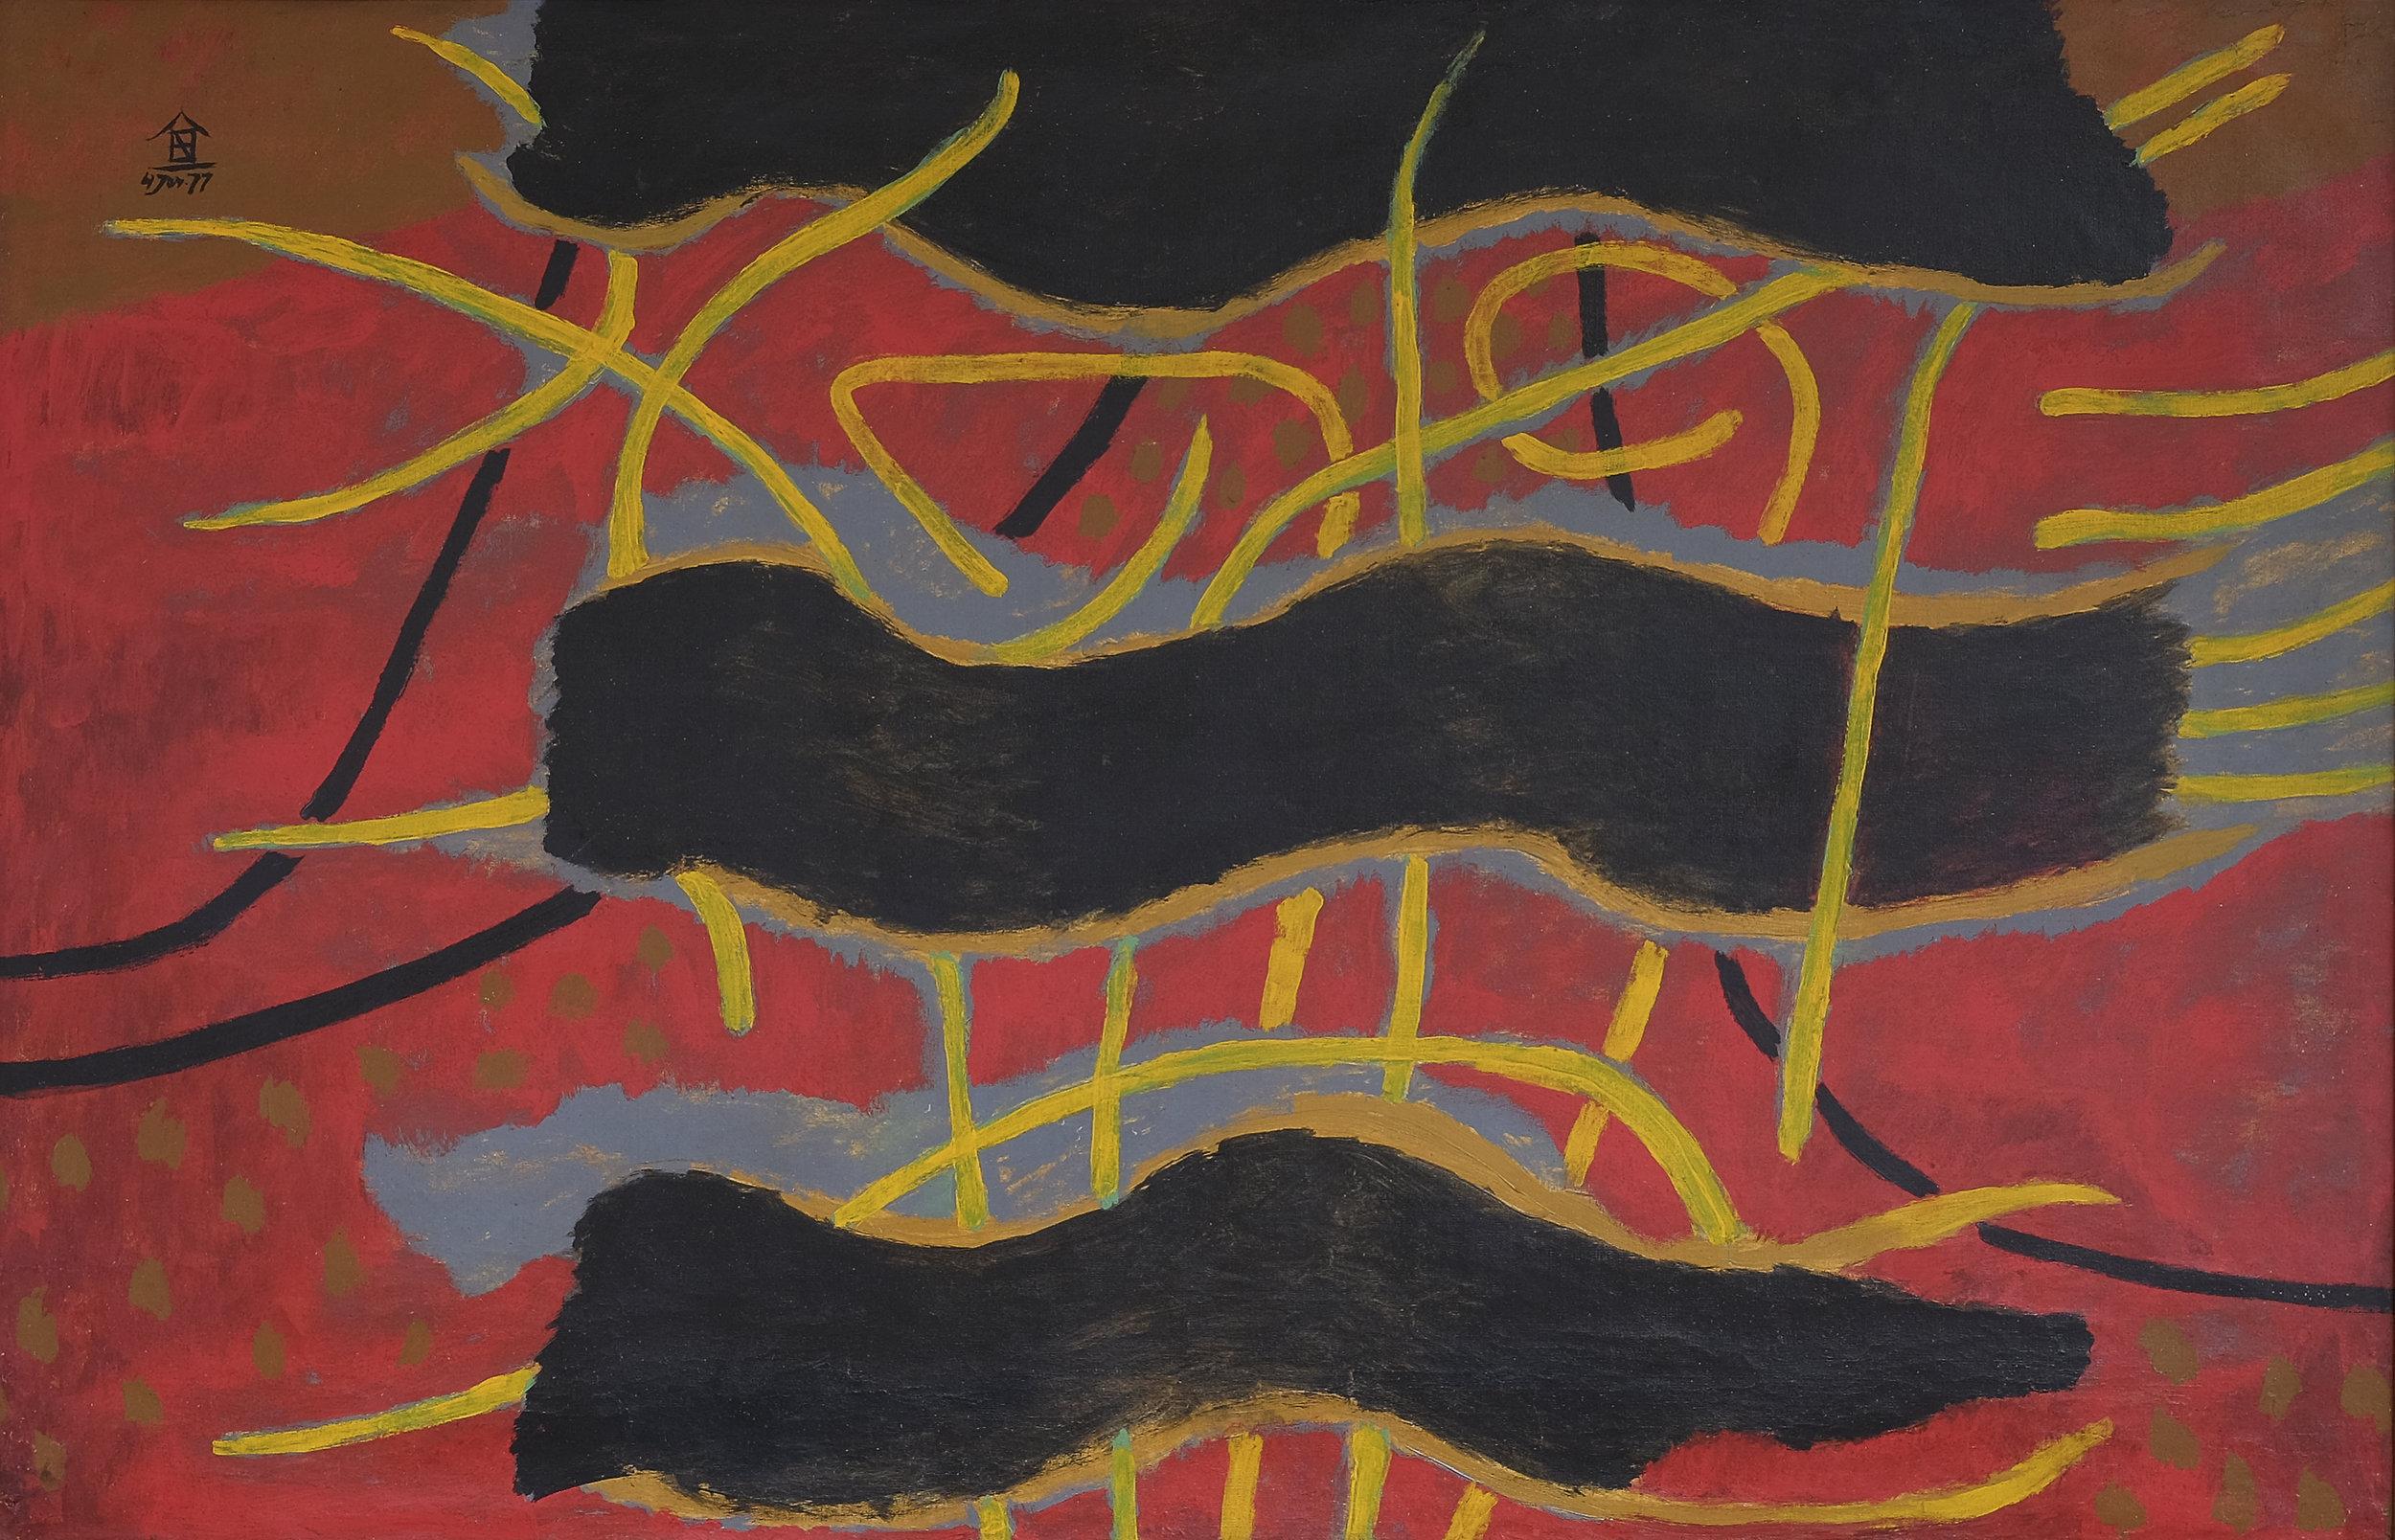 Nashar, Larut Malam, ooc, 90 x 138 cm, 1977.jpeg